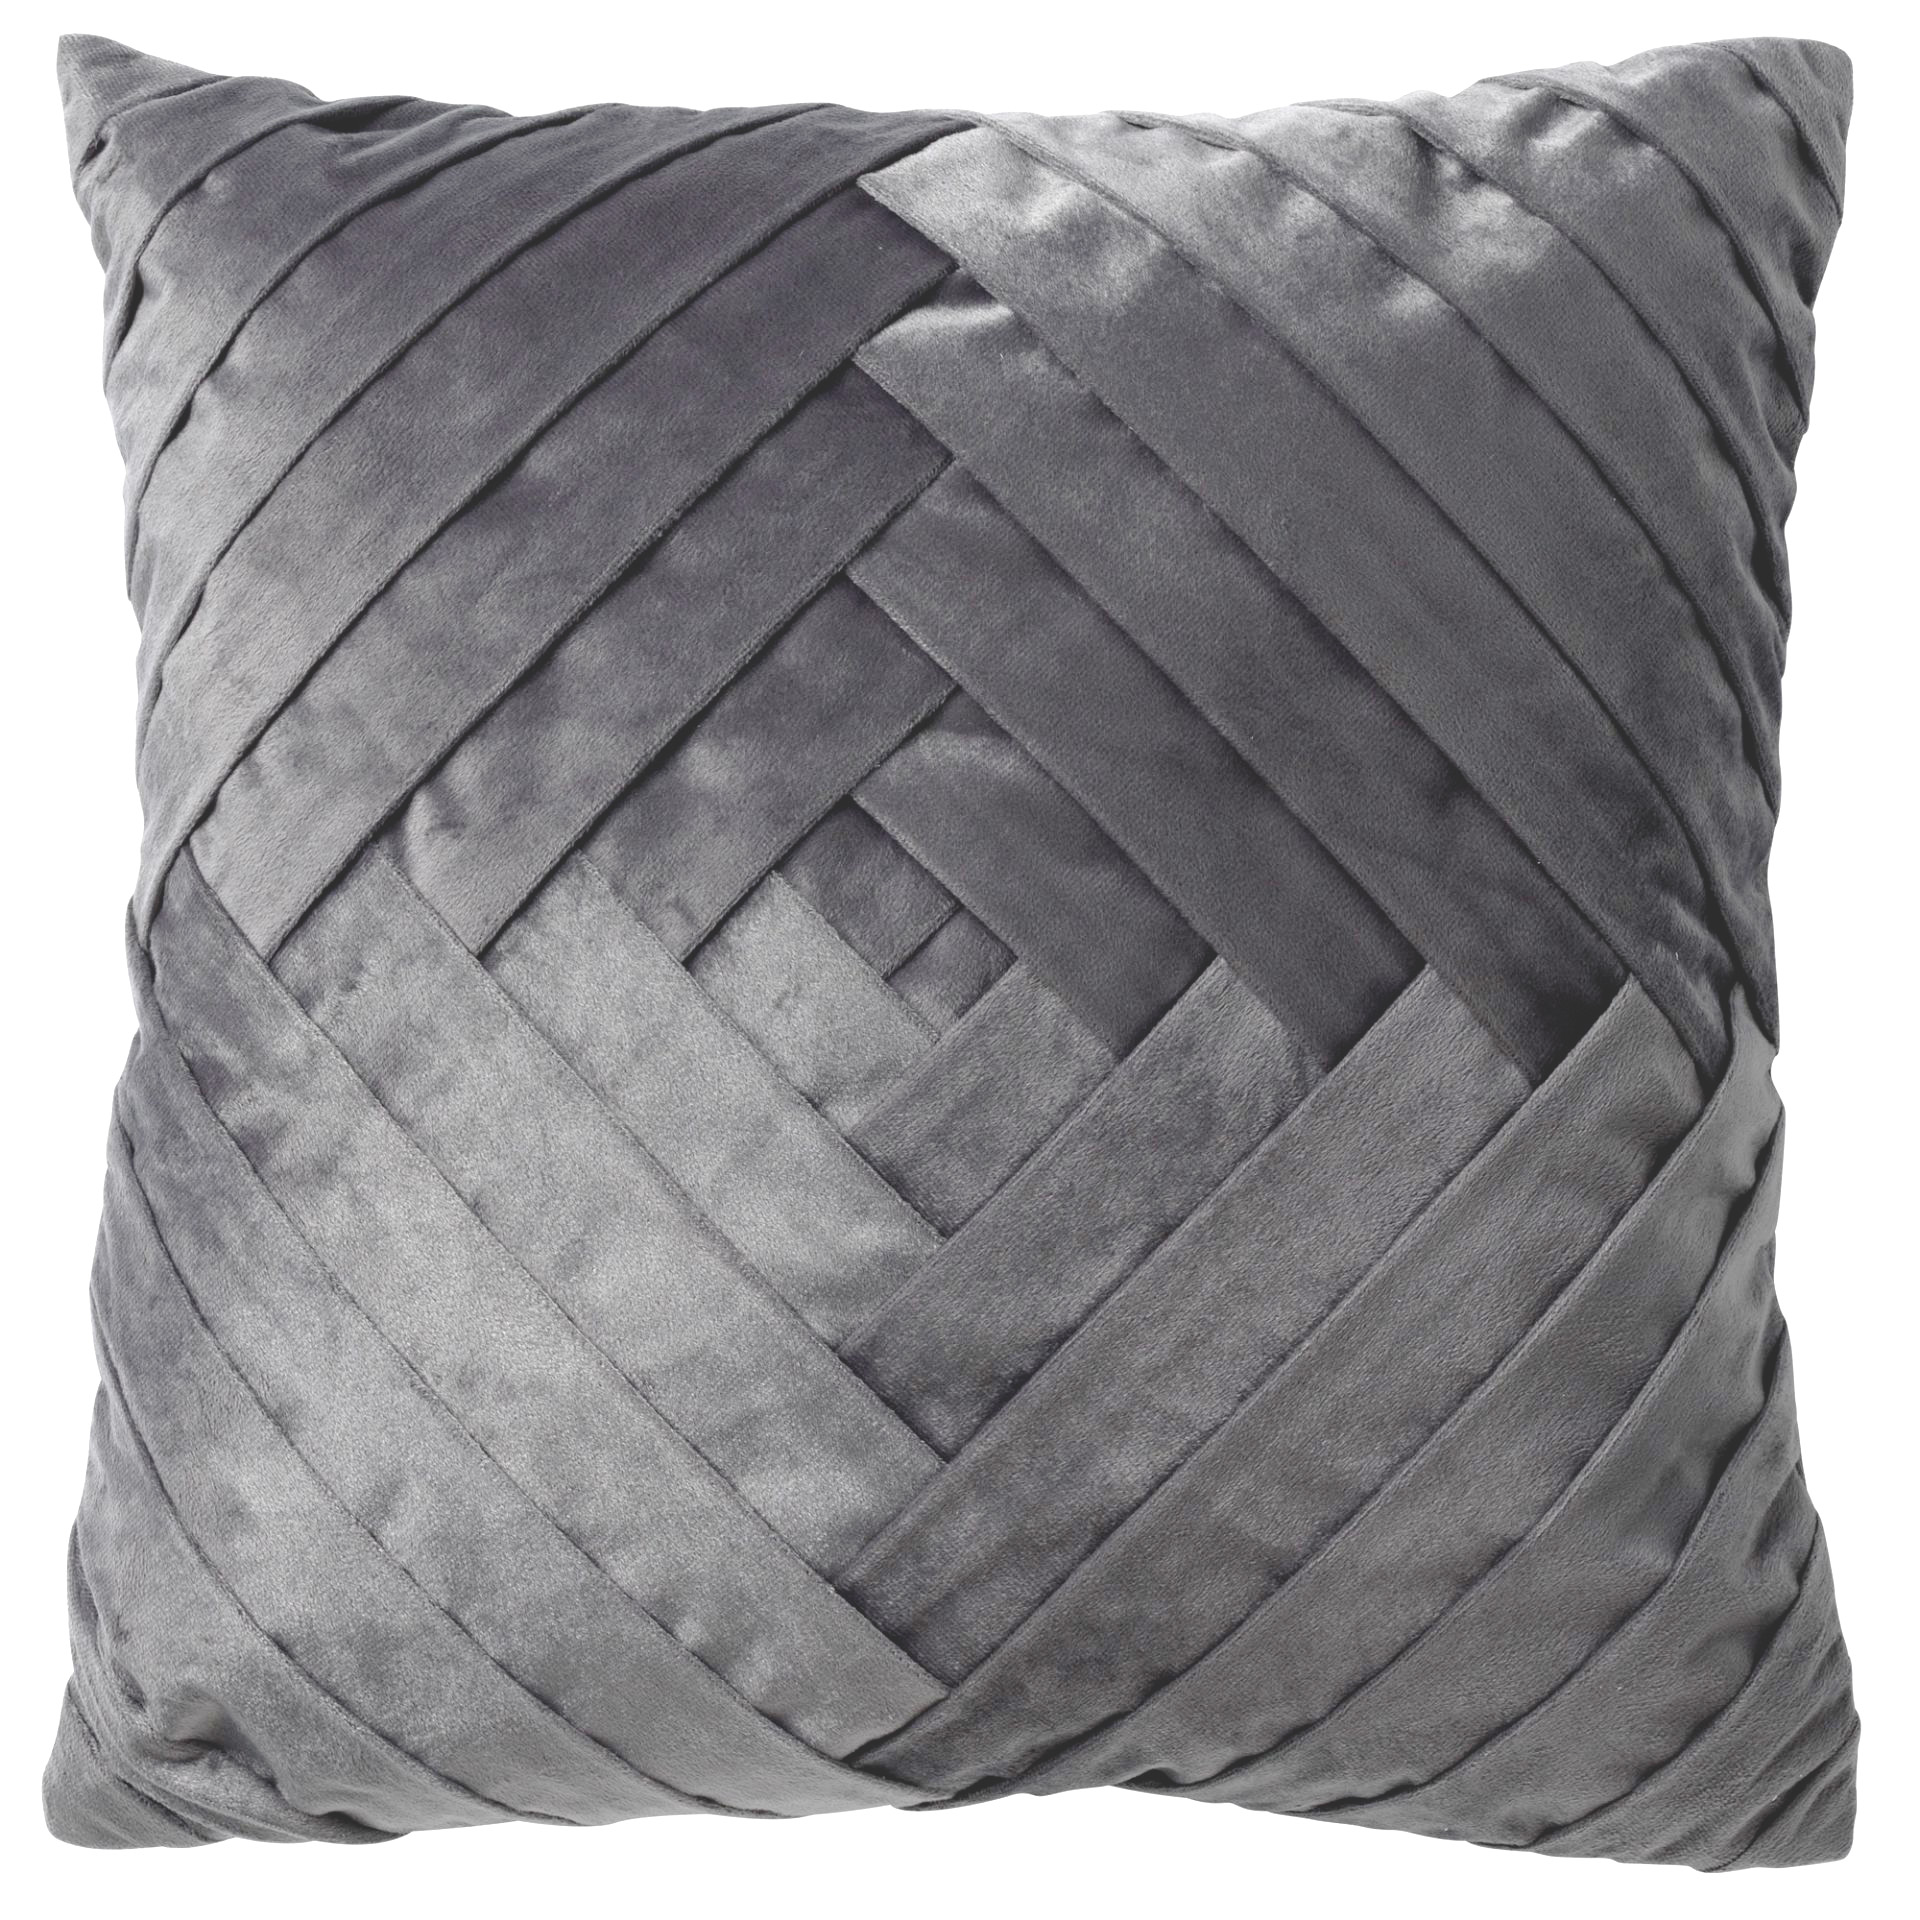 PHILLY - Kussenhoes velvet Charcoal Grey 45x45 cm